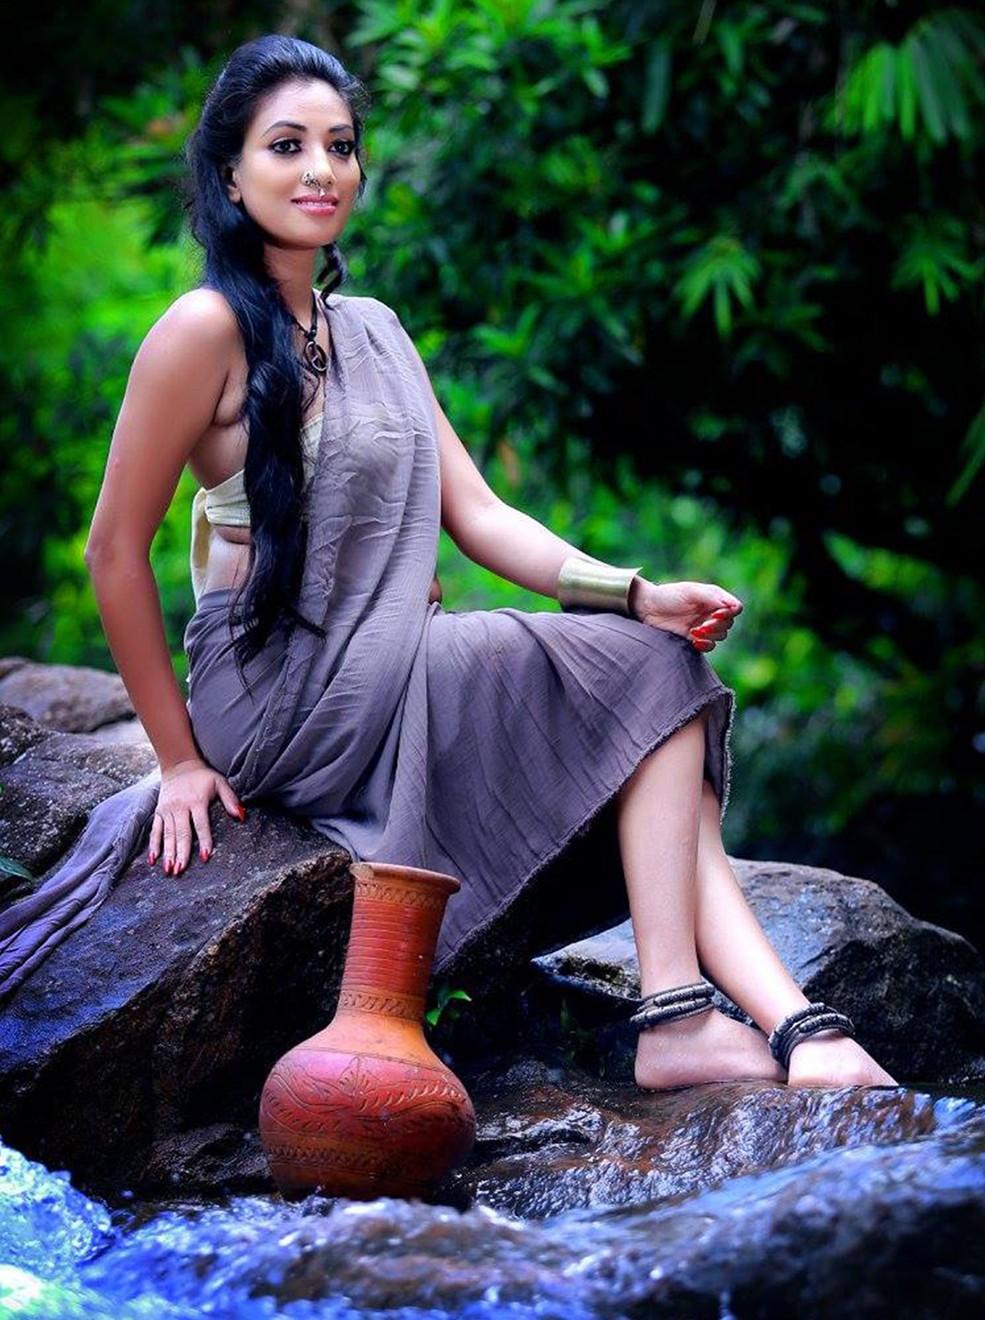 Hashini Madumanjali Hot photo gallery | Sri Lankan Actress and Models Bank